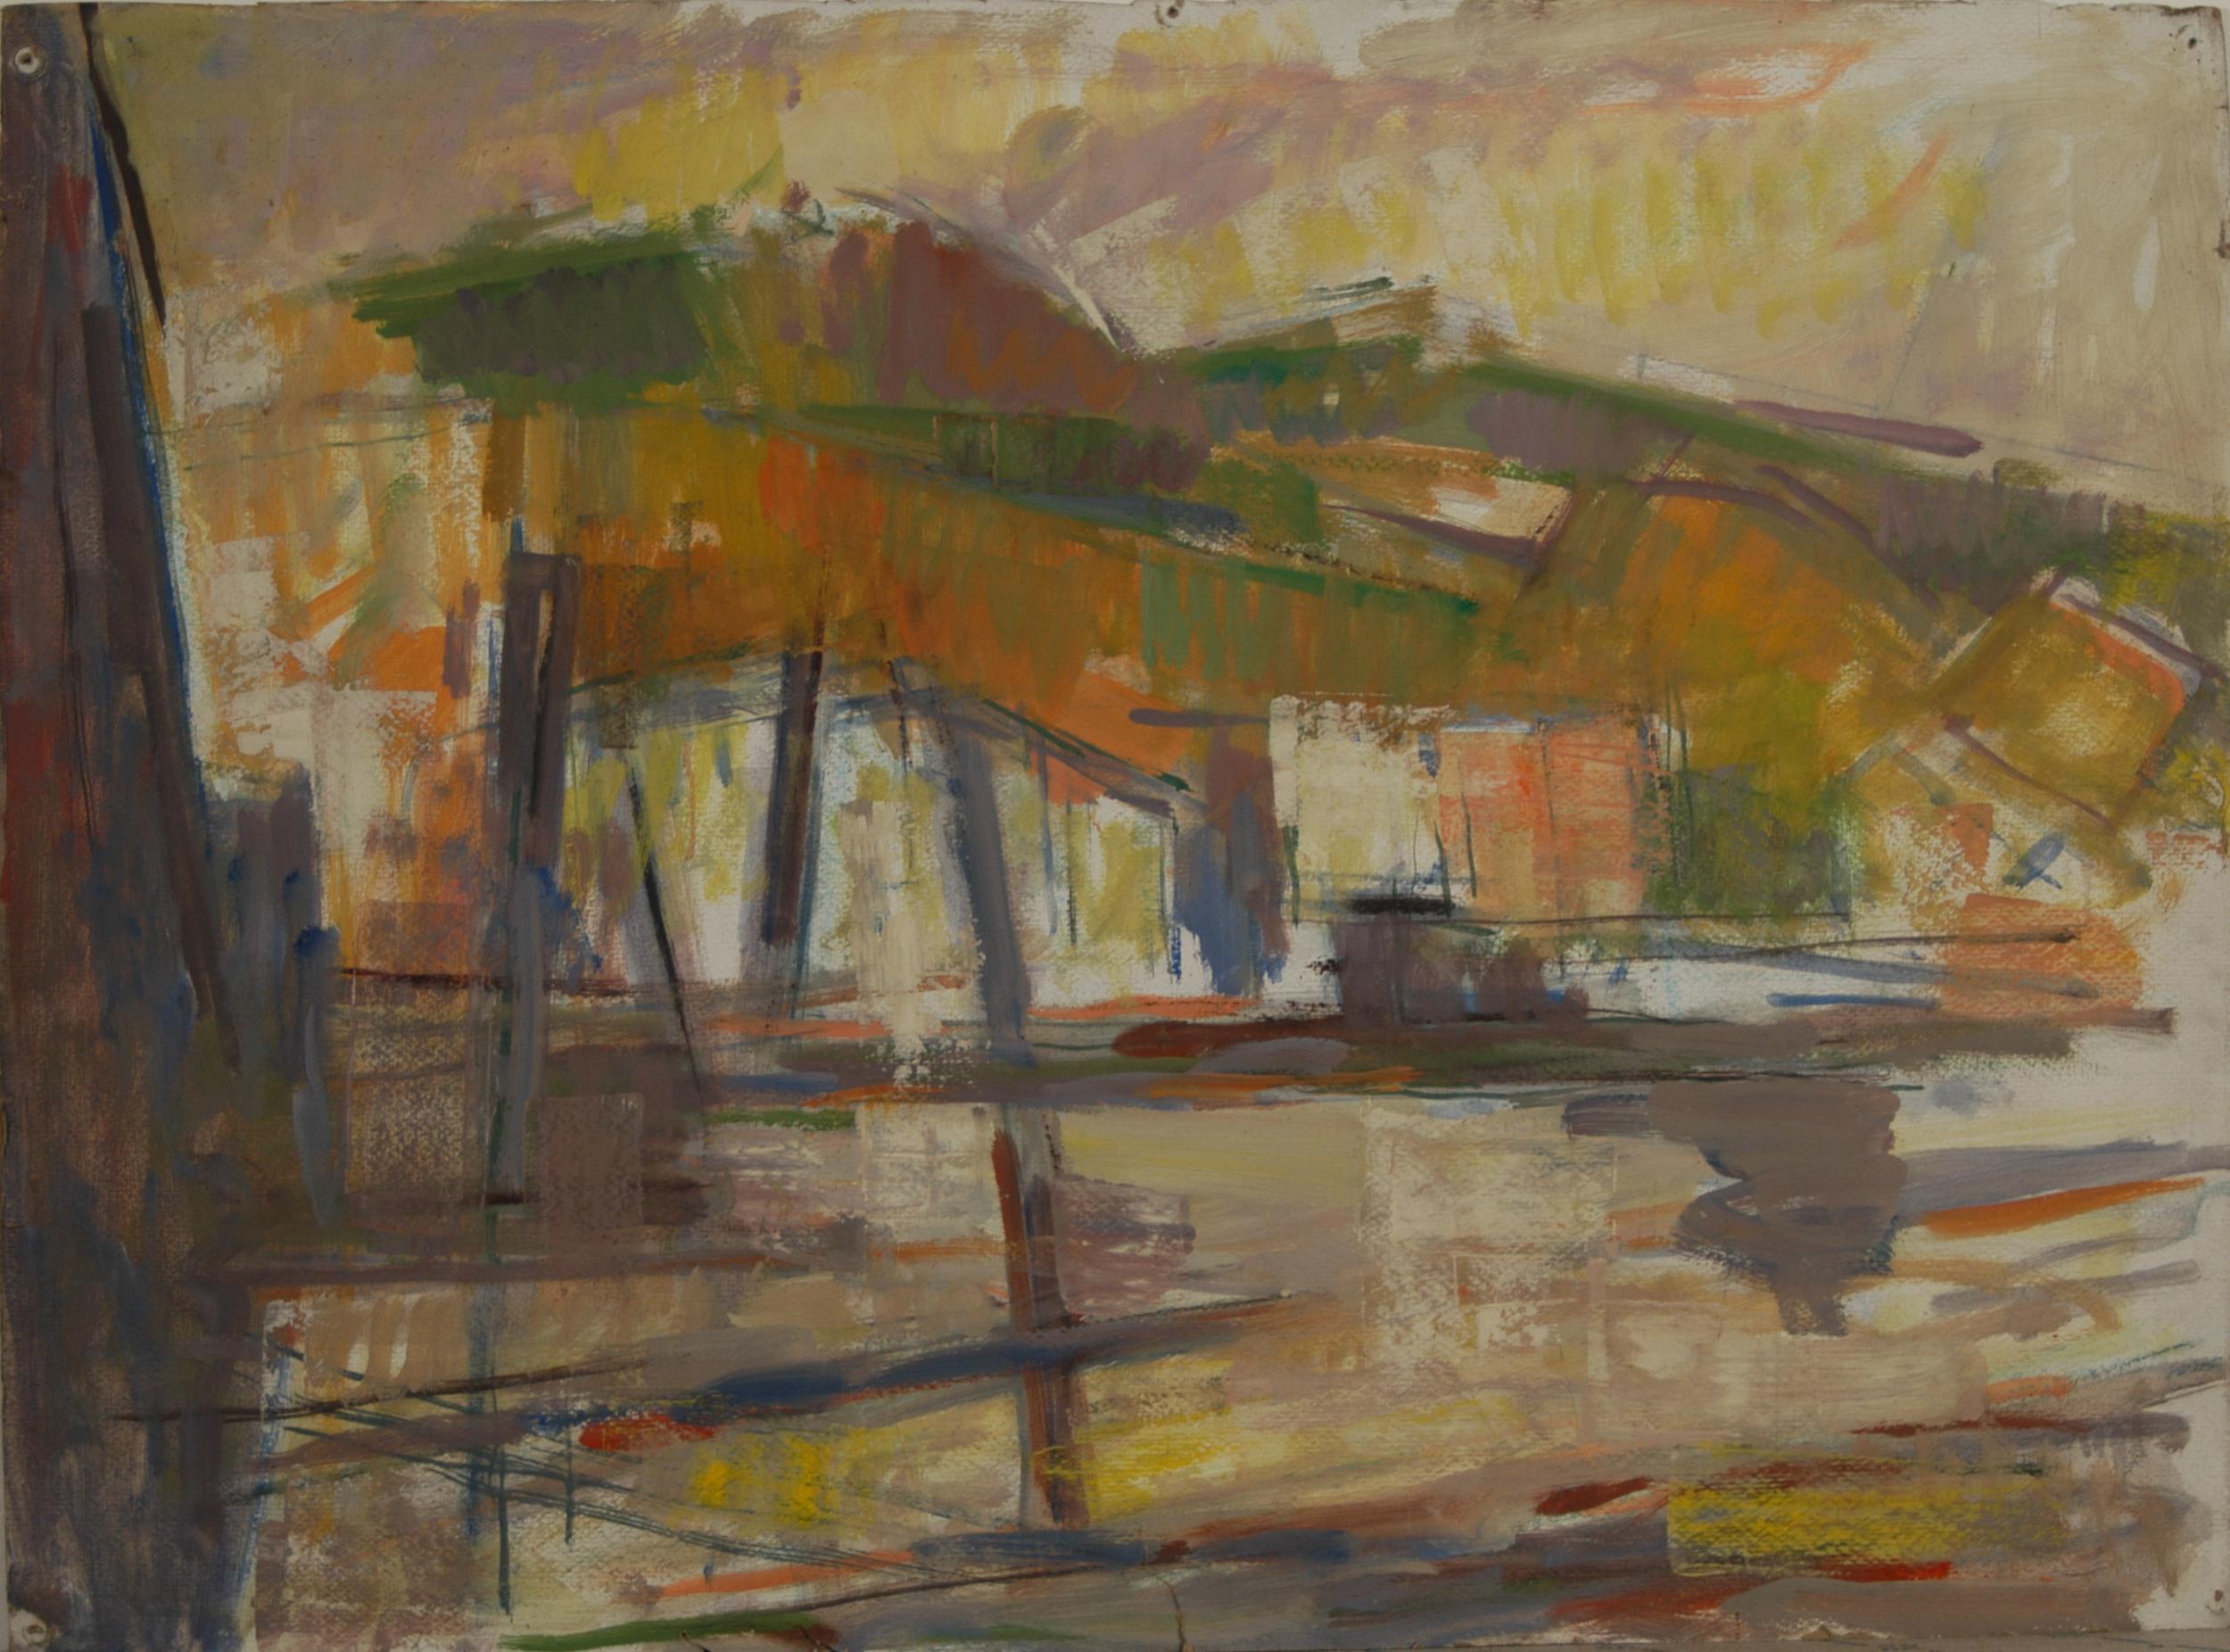 Les docks